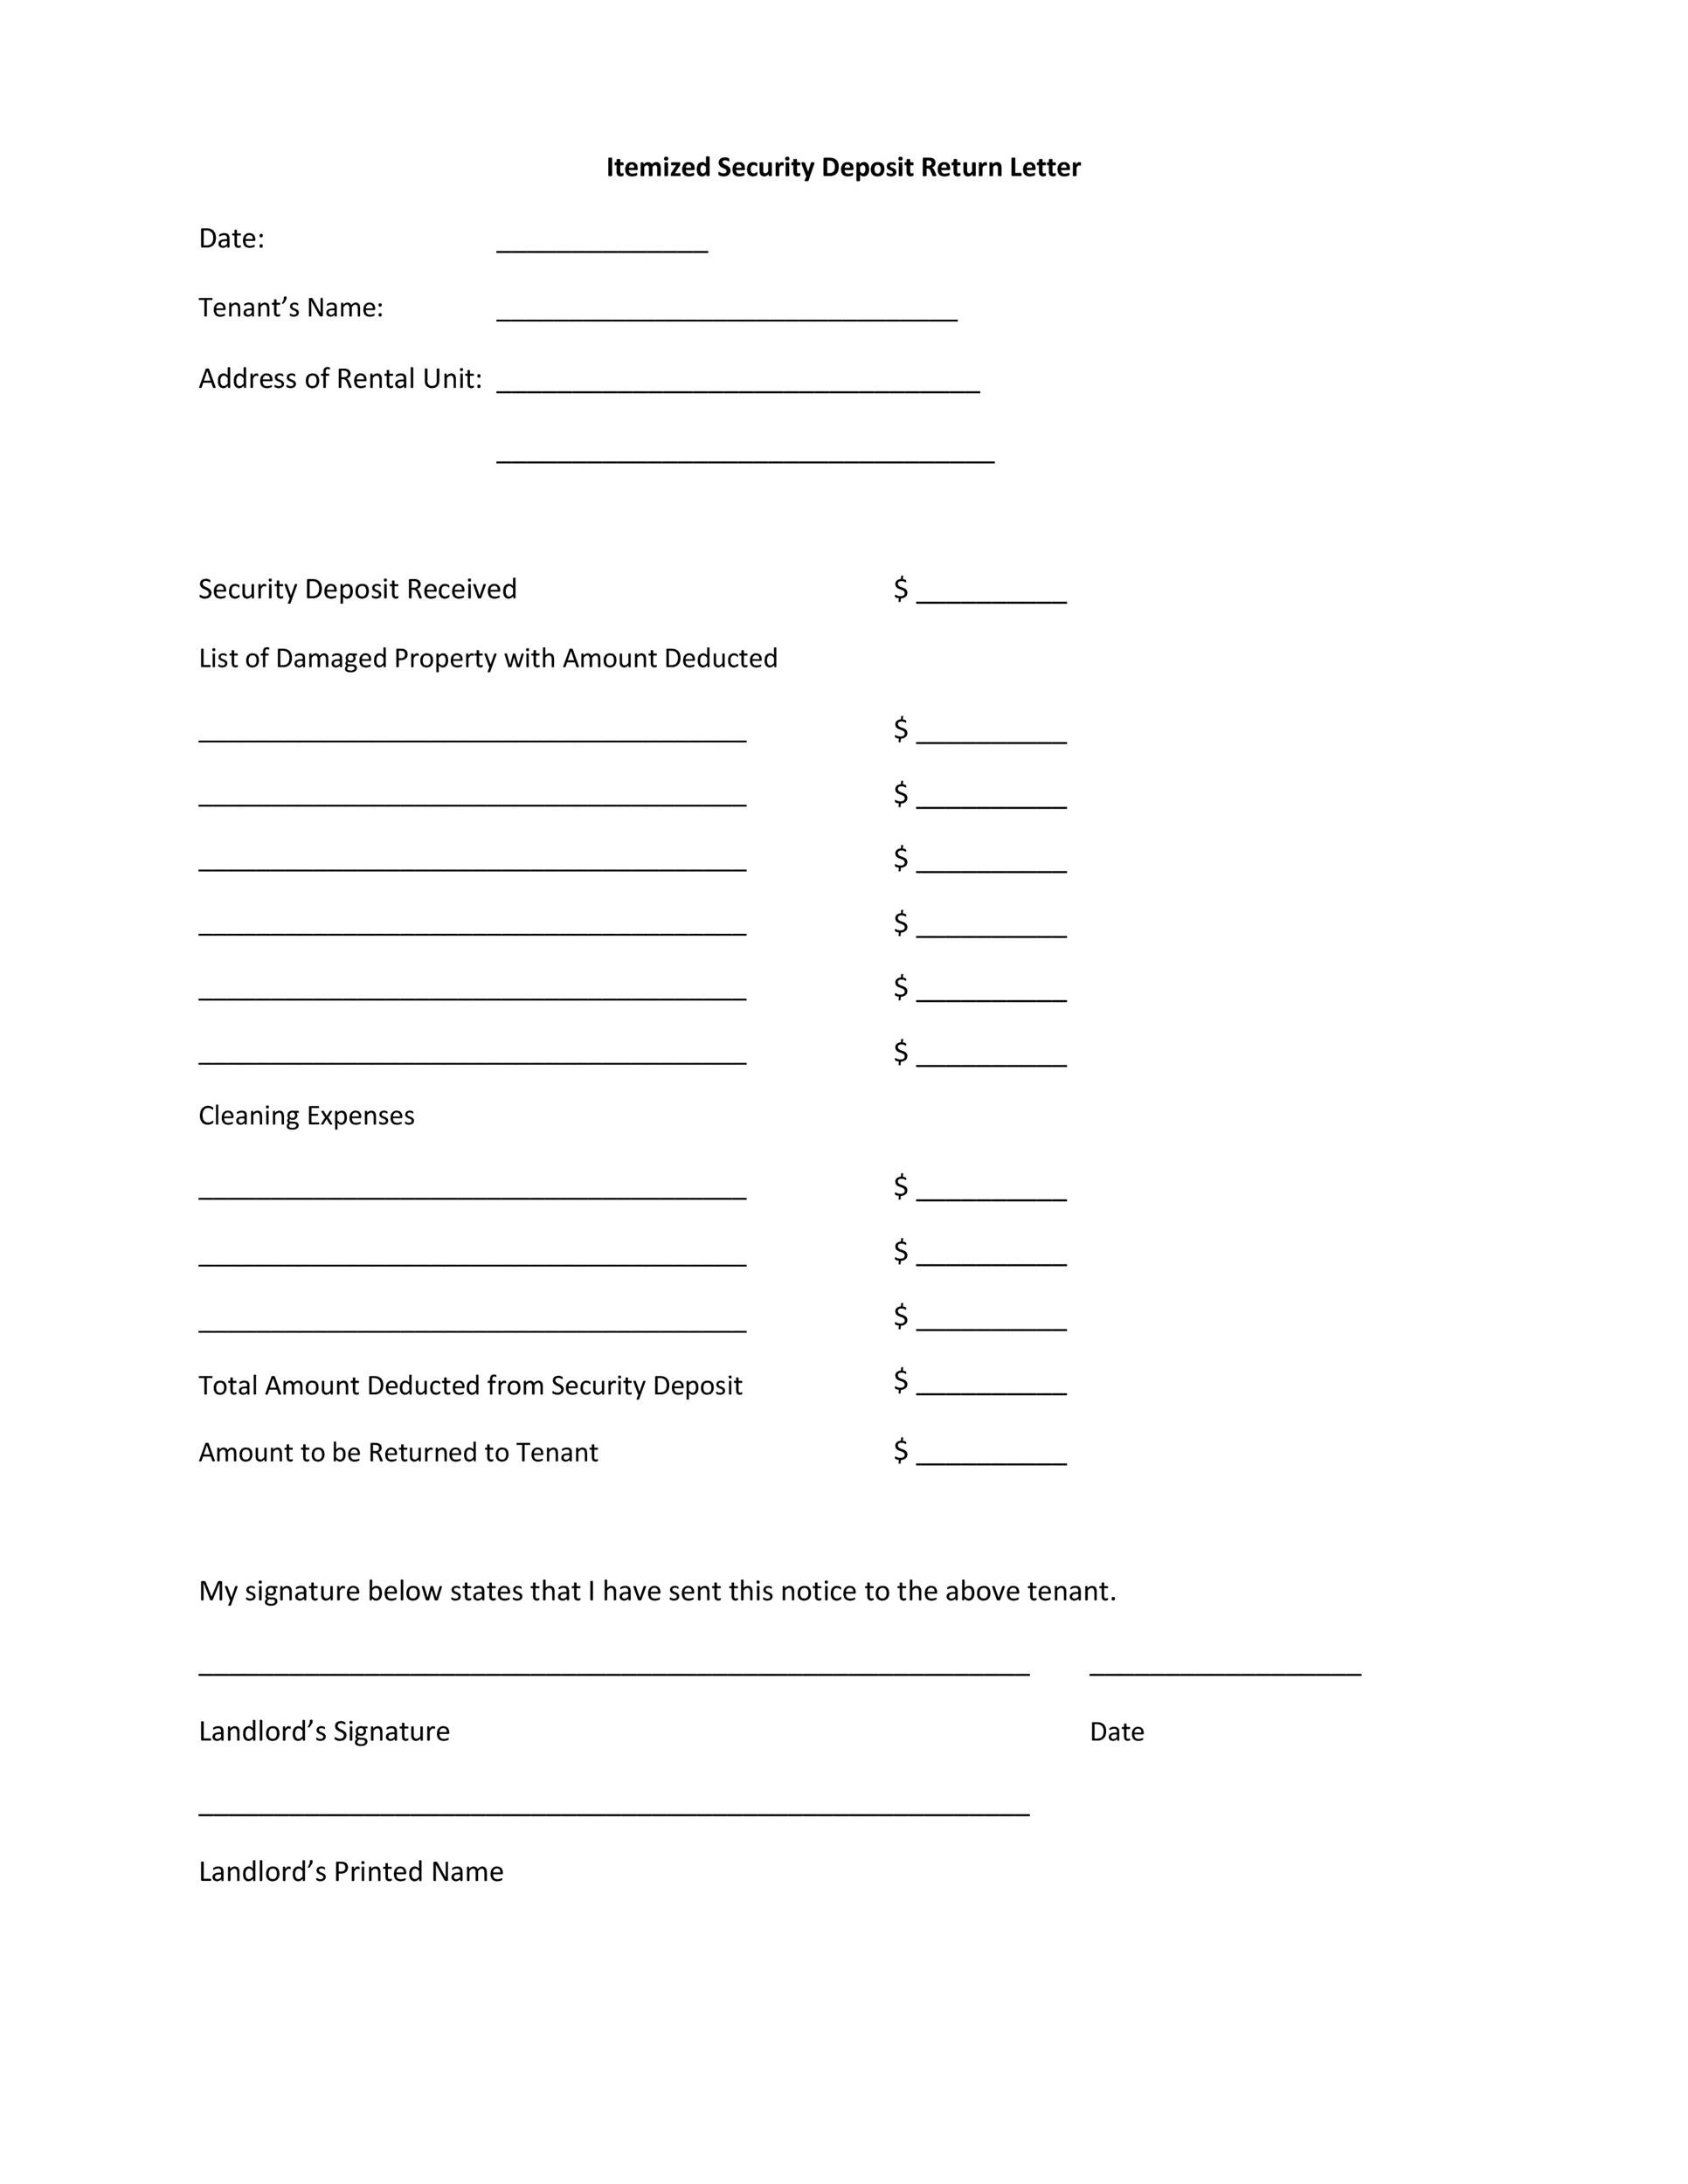 Free security deposit return letter 20